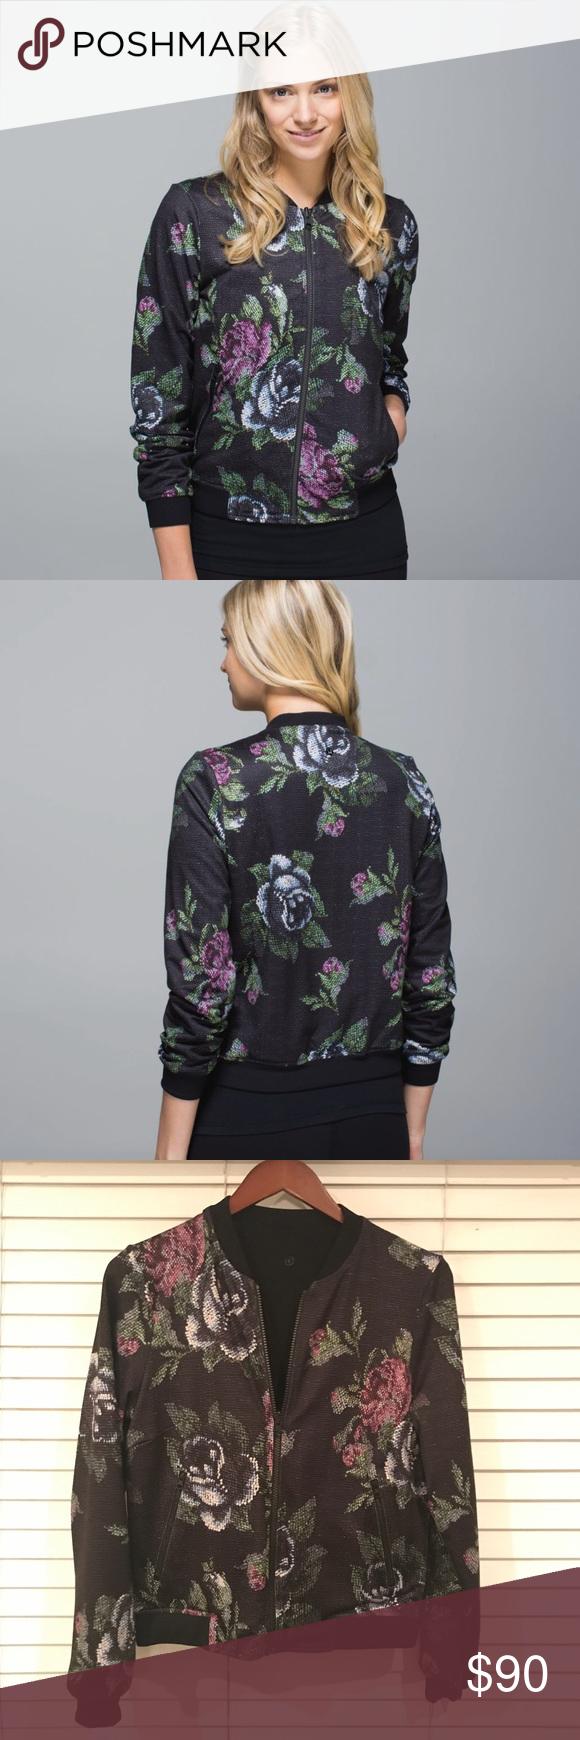 lululemon reversible bomber jacket solid black lululemon